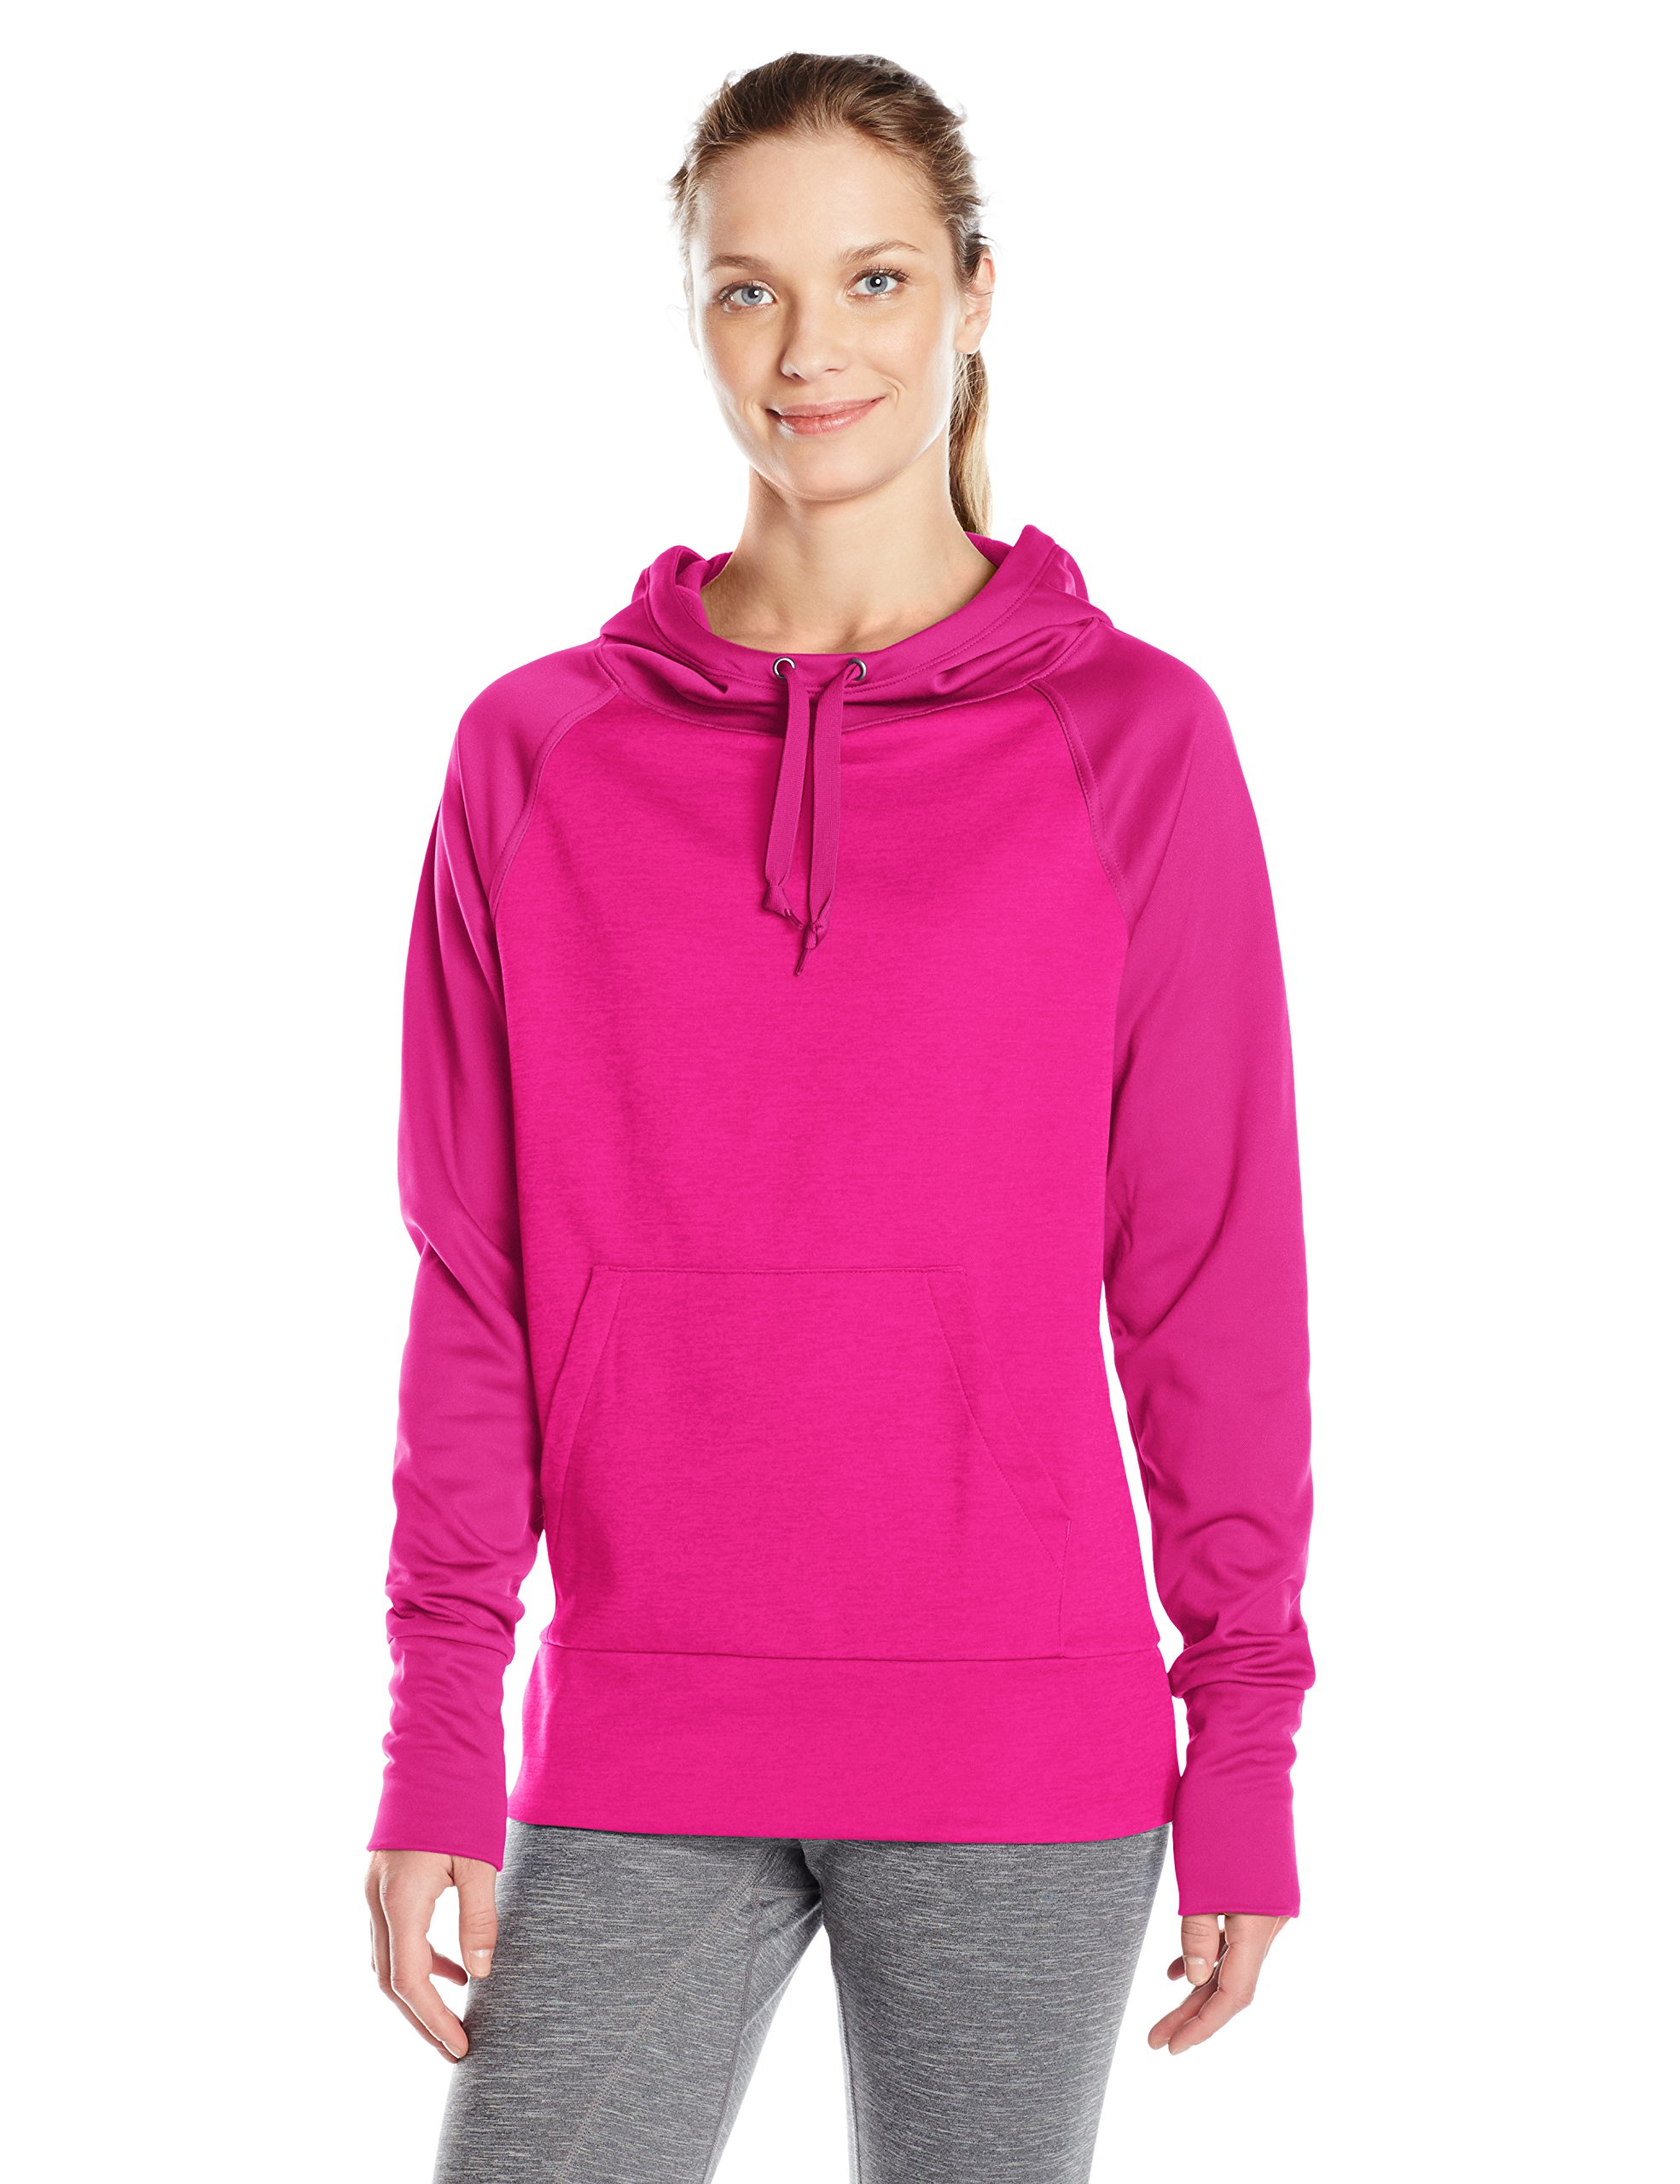 Hanes Women's Sport Performance Fleece Pullover Hoodie, Fresh Berry Solid/Fresh Berry Heather, 2XL by Hanes